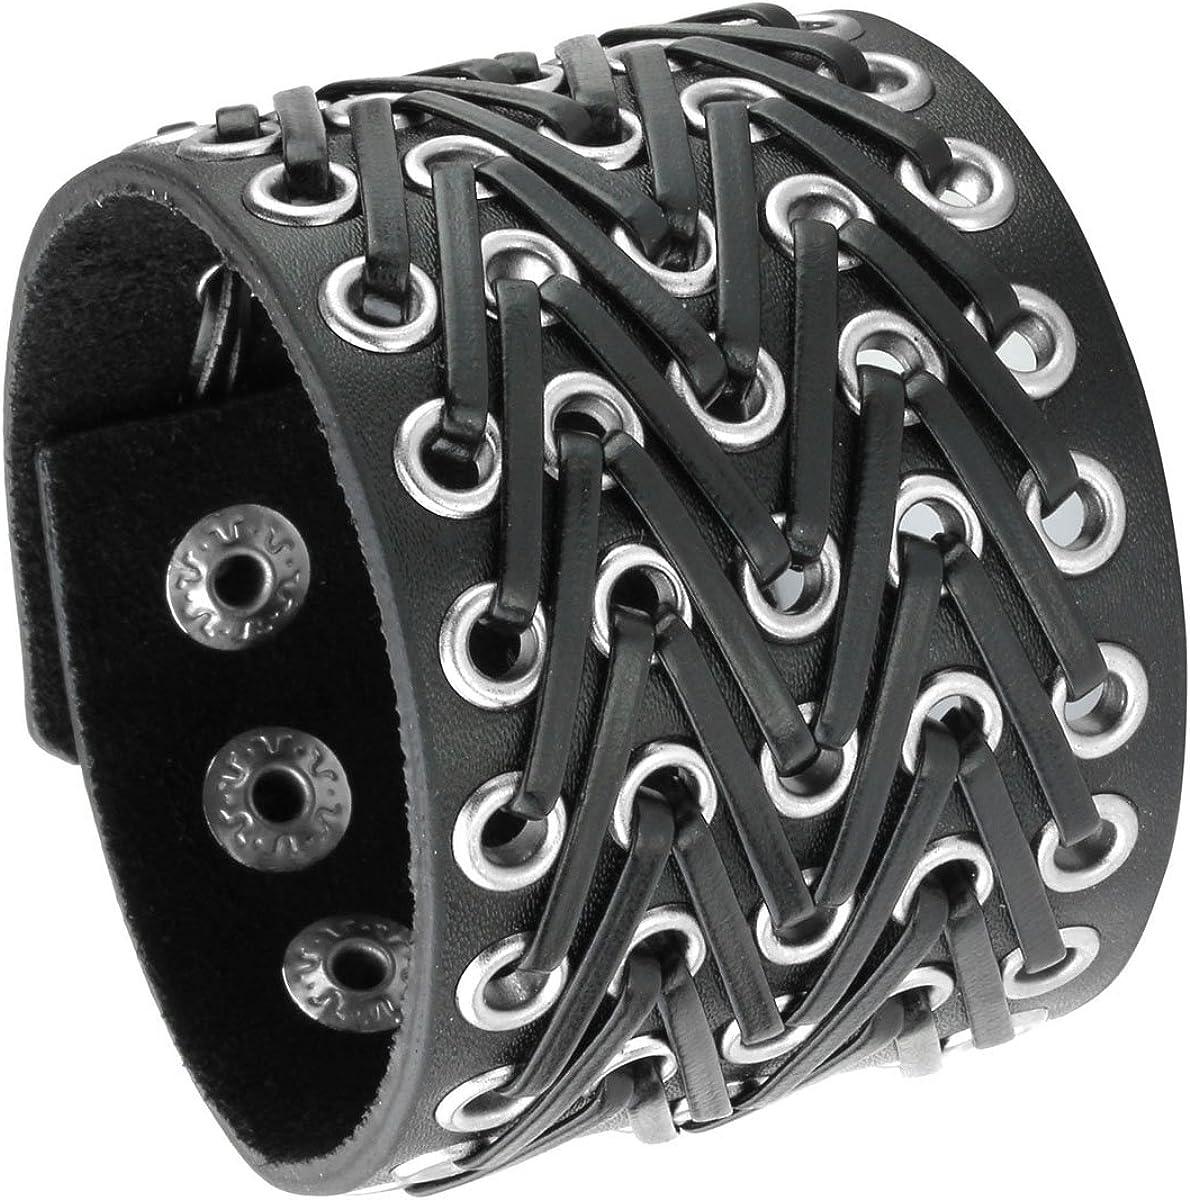 Eigso Black Retro Gothic Punk Wide Strap Leather Bracelet Snap Button Wristband for Men Women